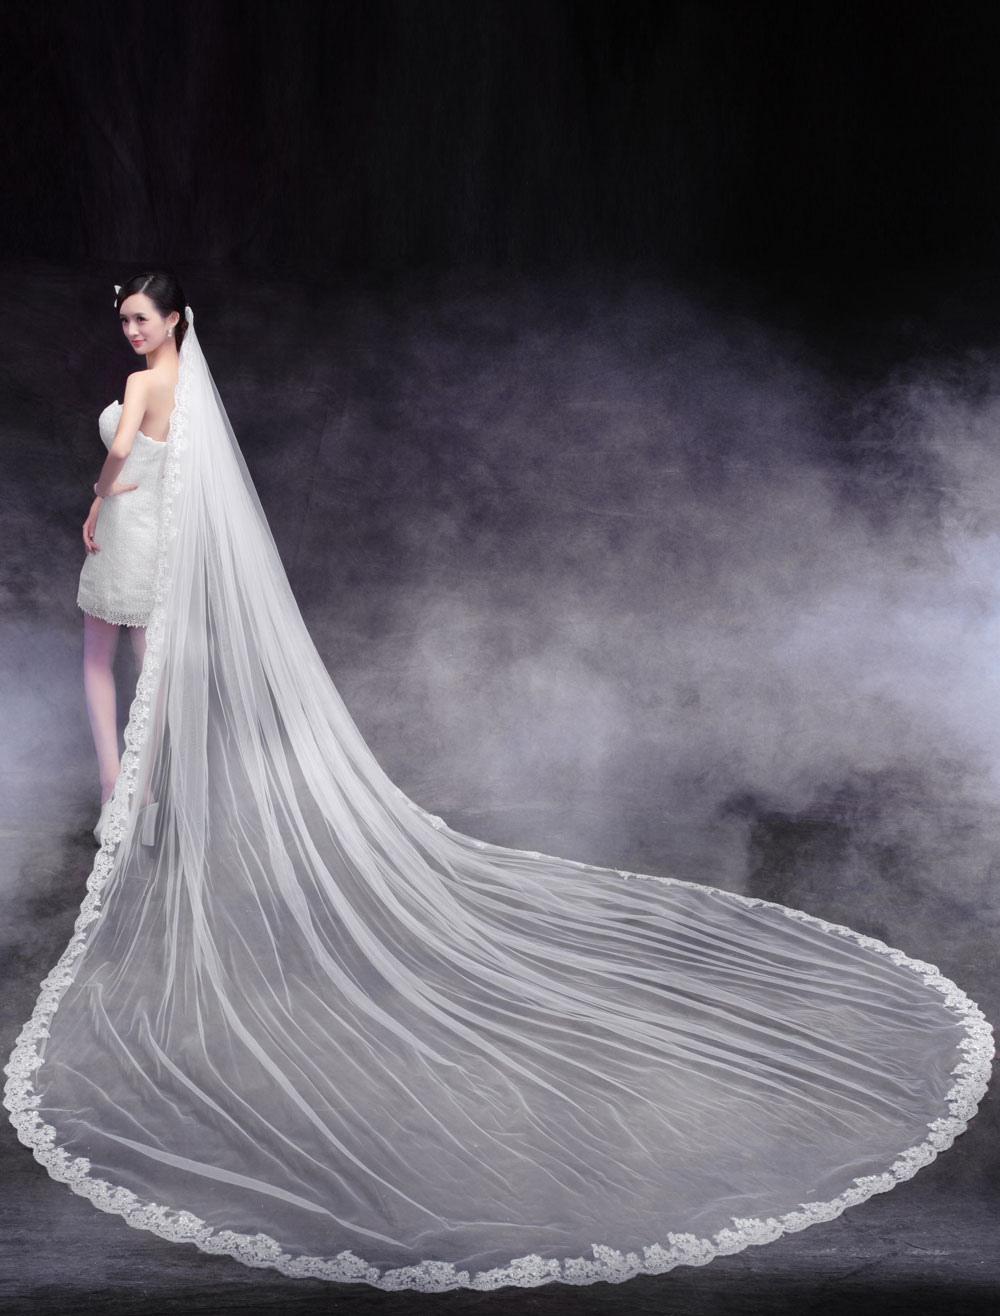 Elegant One-Tier Lace Tulle Bridal 350cm Wedding Veils